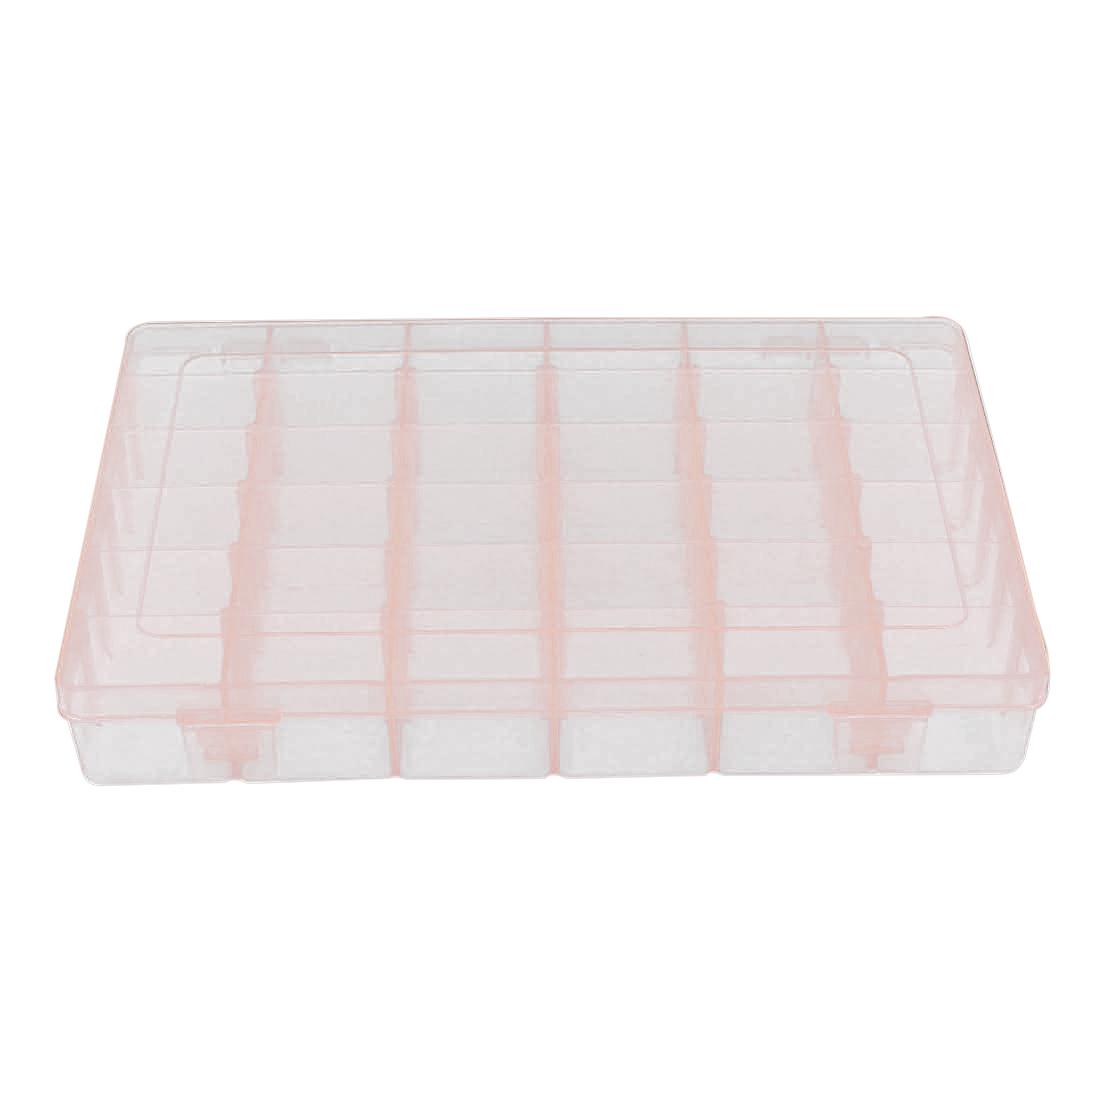 Electronic Components Tool Rectangle Plastic Detachable 36 Slots Storage Case Box Organizer Holder Clear Pink 27.5cmx17.5cmx4.5cm